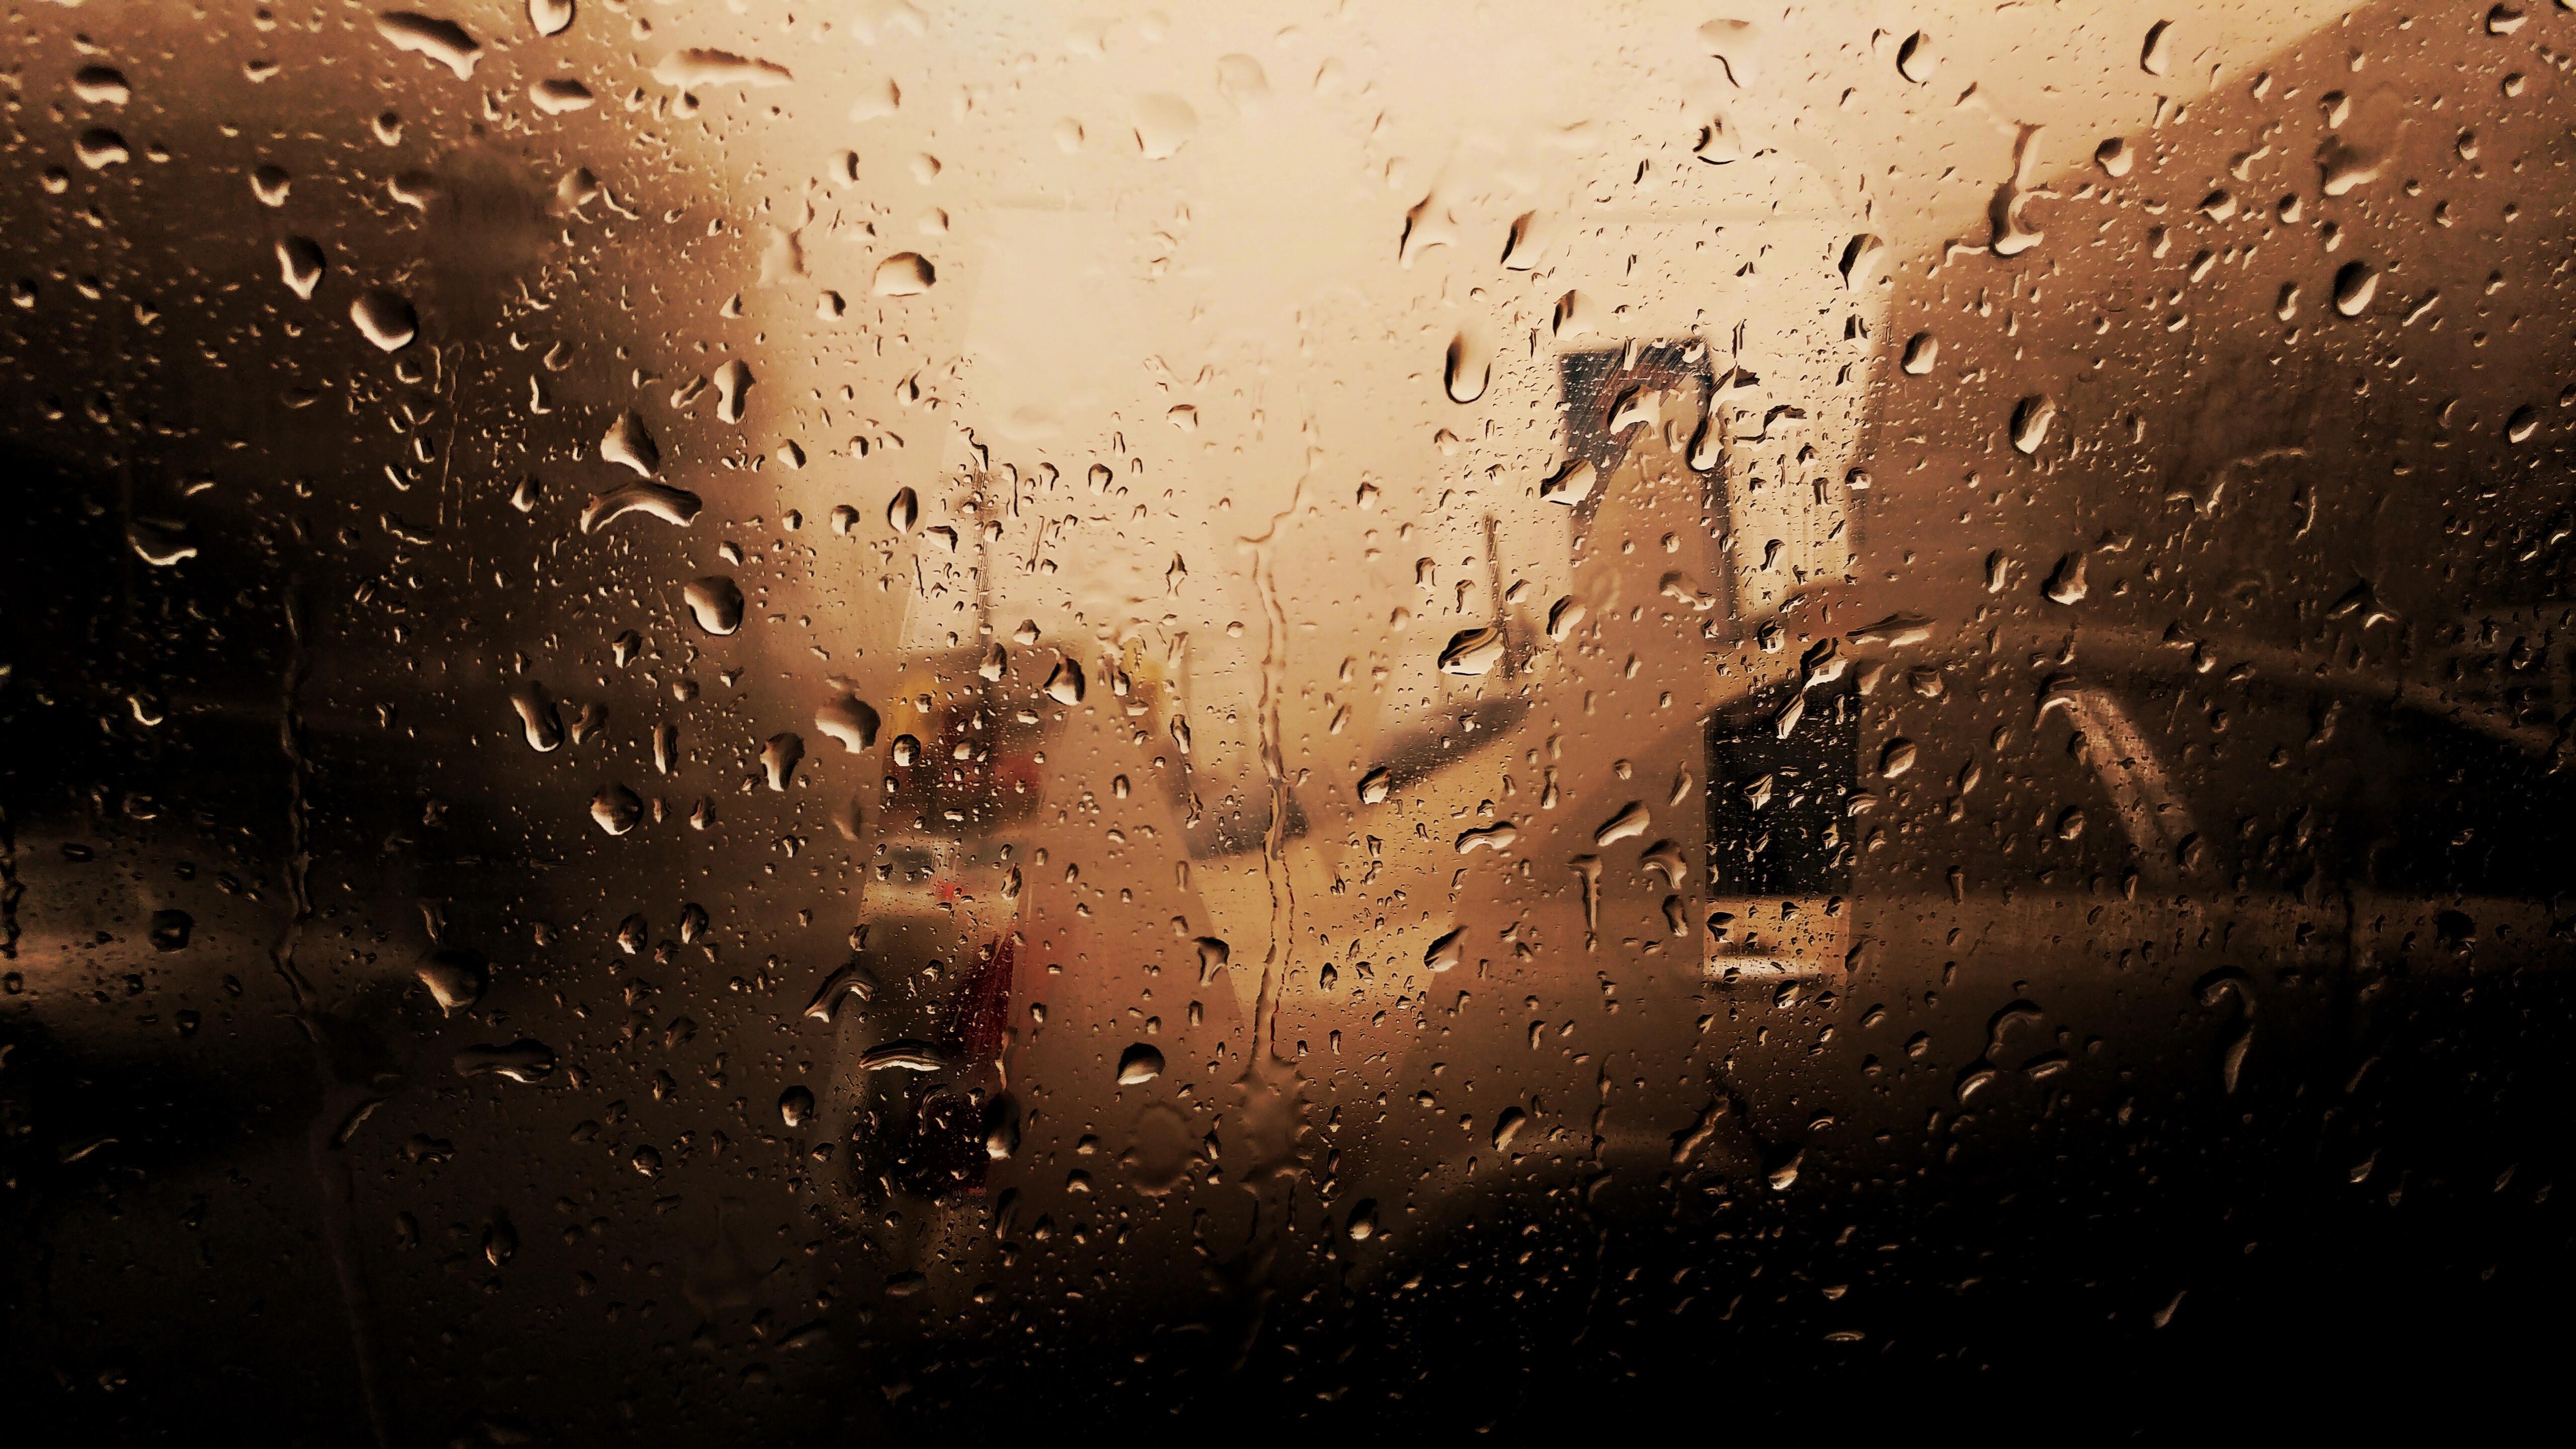 5120x2880 Water Droplets On Car Windshield Rainy Season 4k